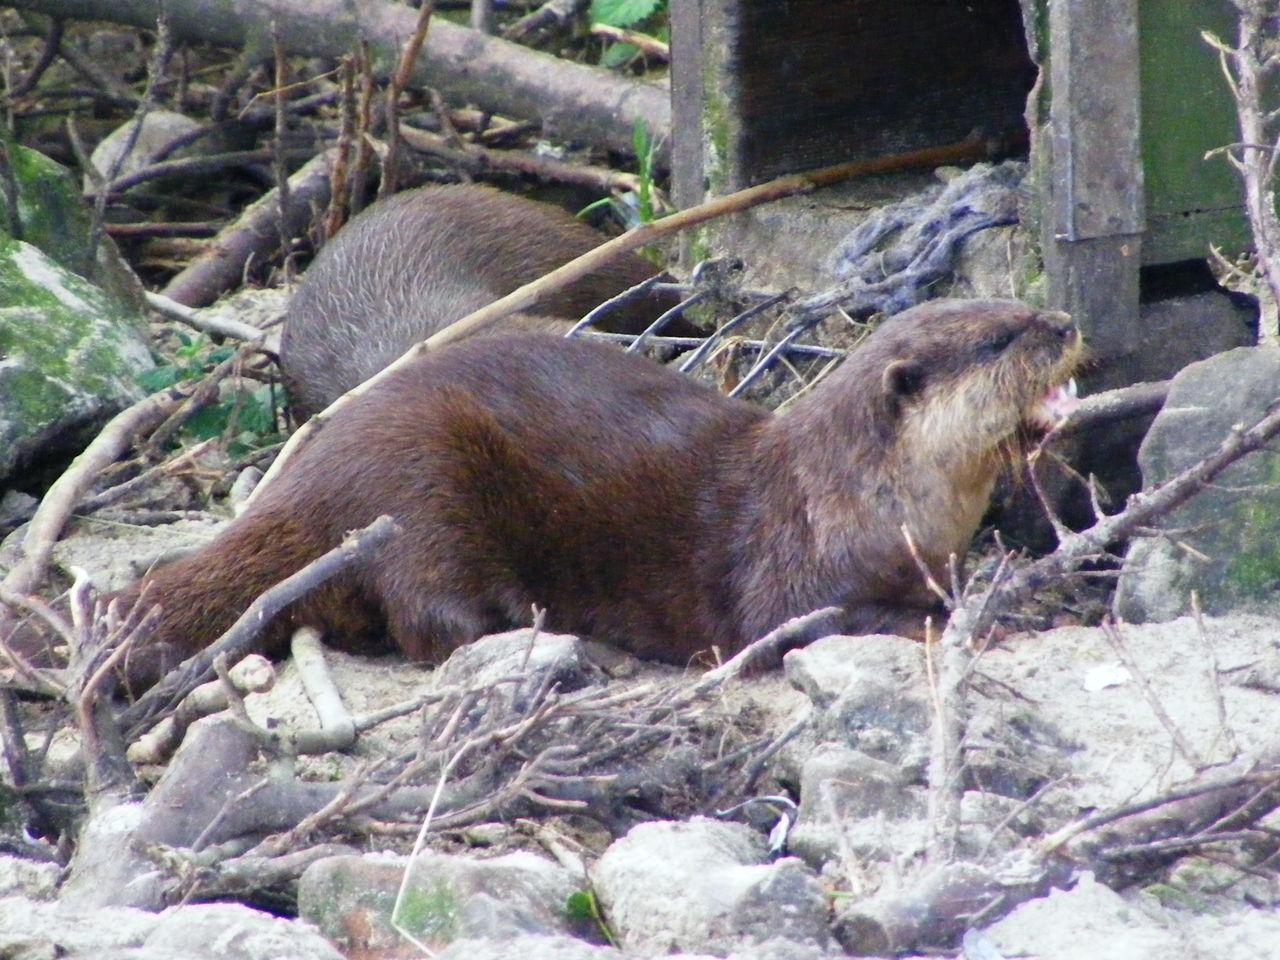 Animal Animal Photography Animal Themes Animals Mammal Otter Otter Photography Otters Wildlife